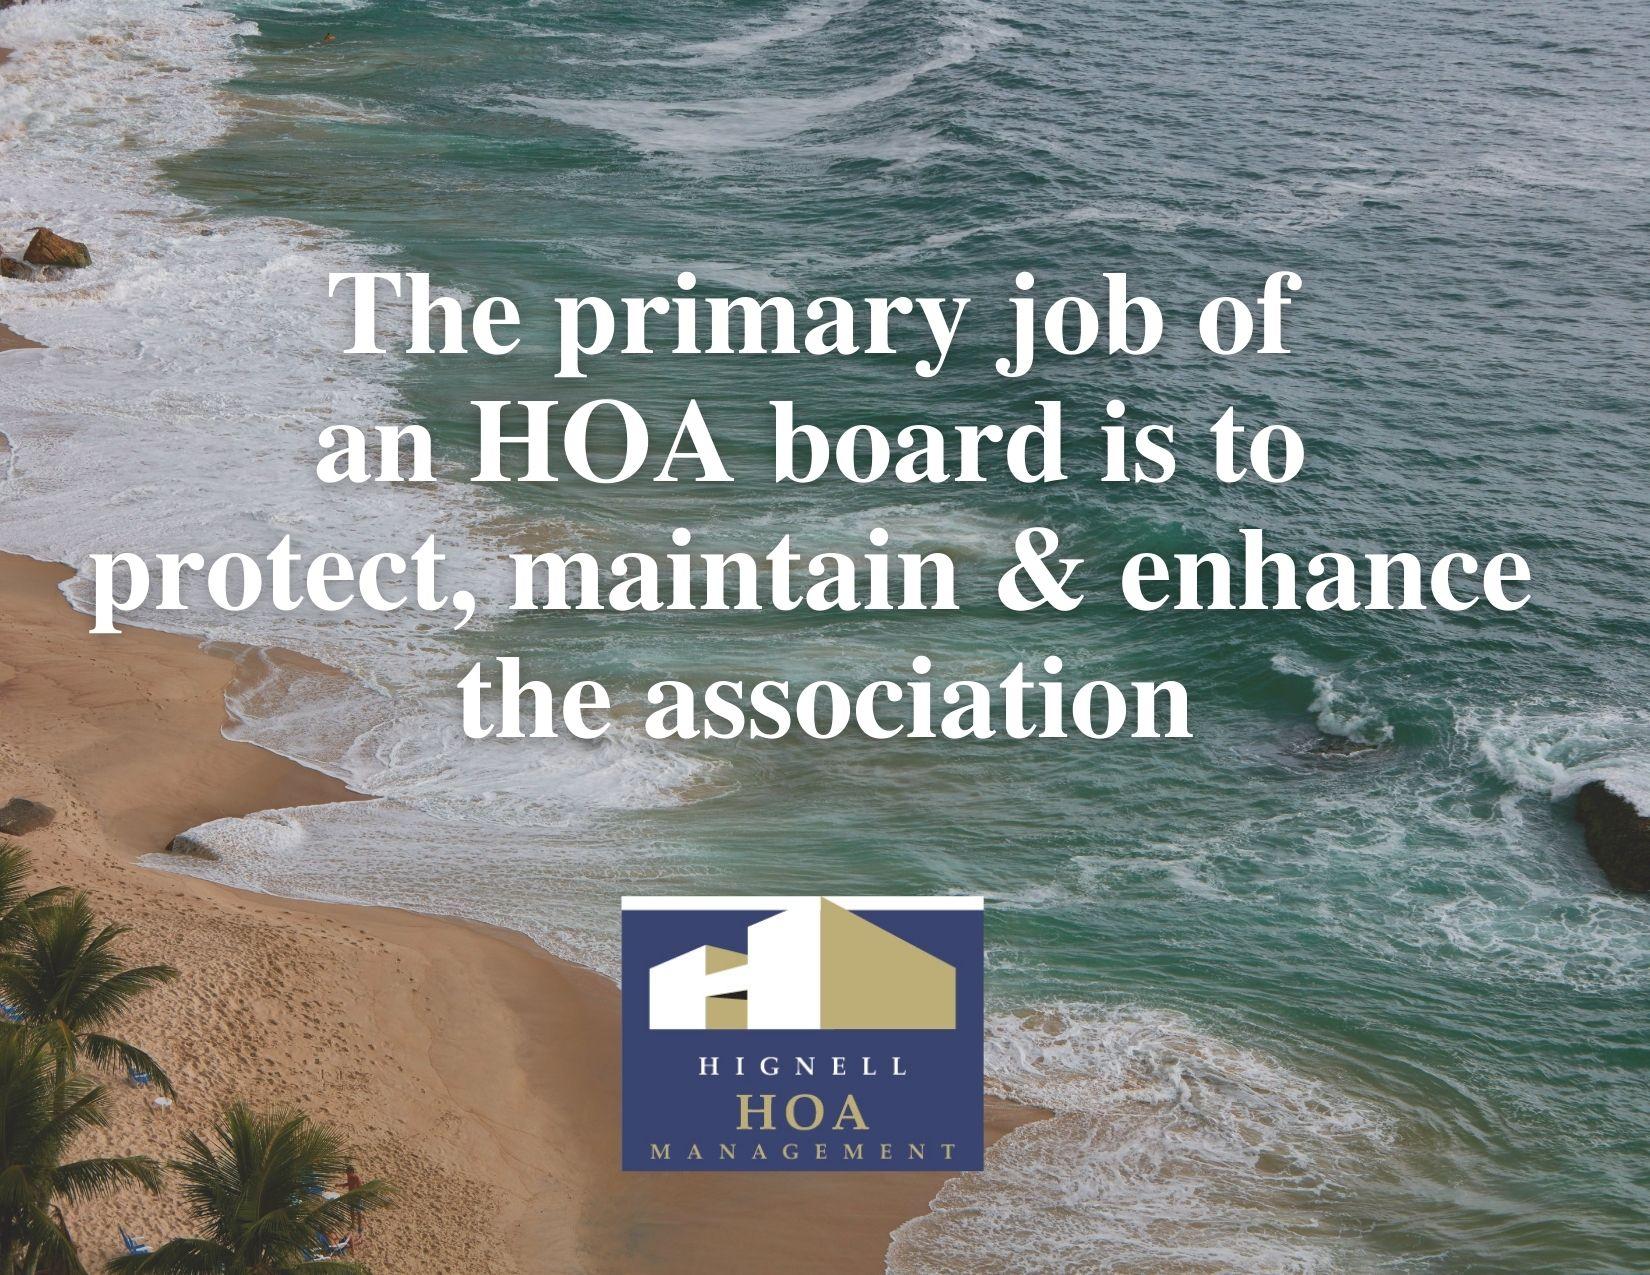 Hignell HOA beach quote